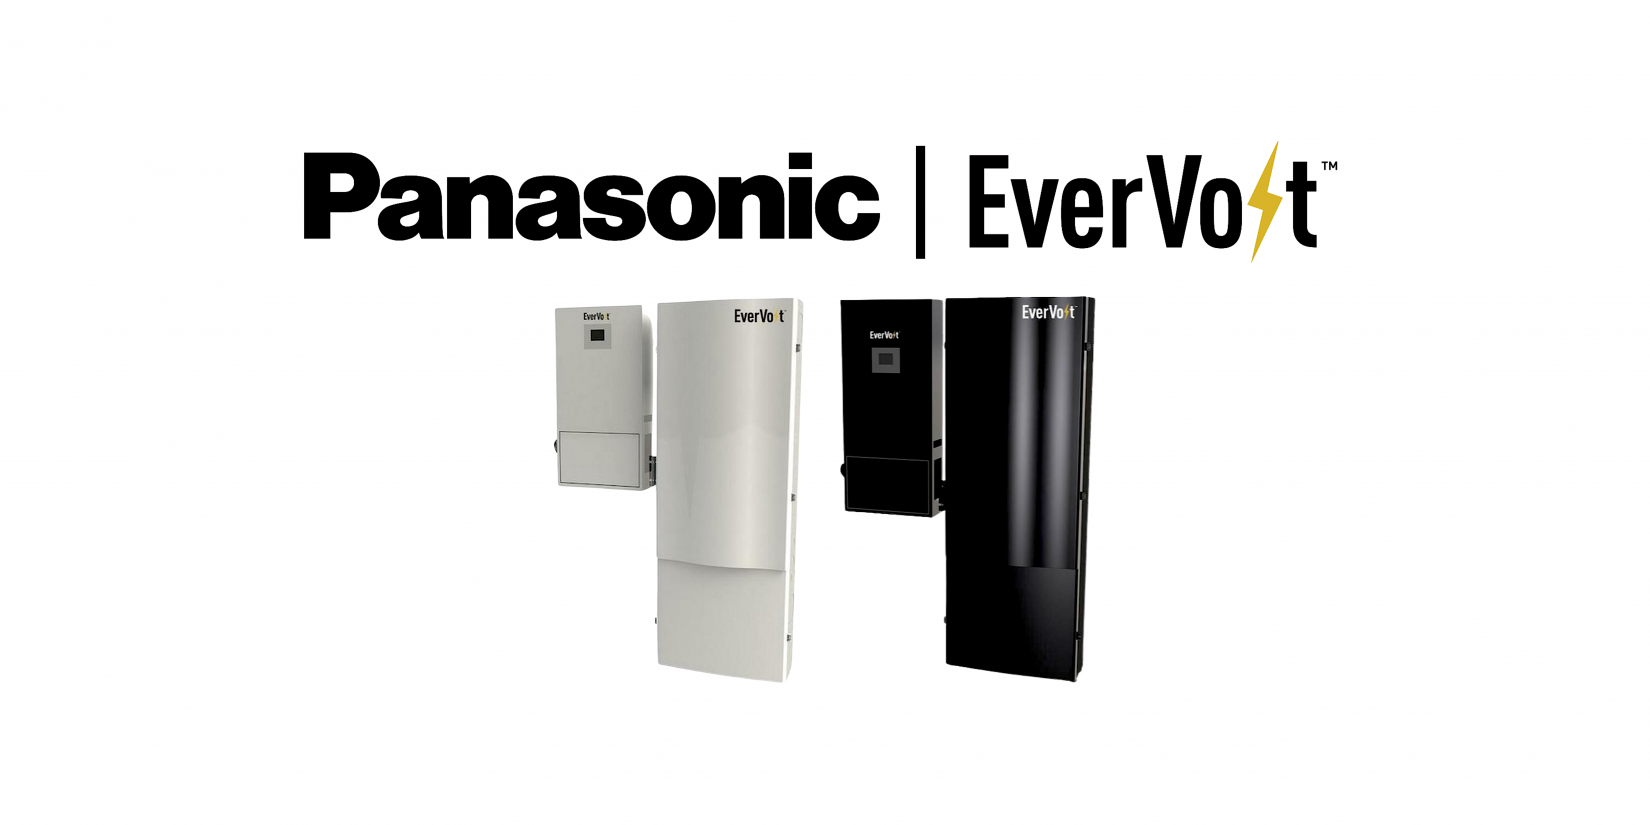 Panasonic and Evervolt Energy Storage